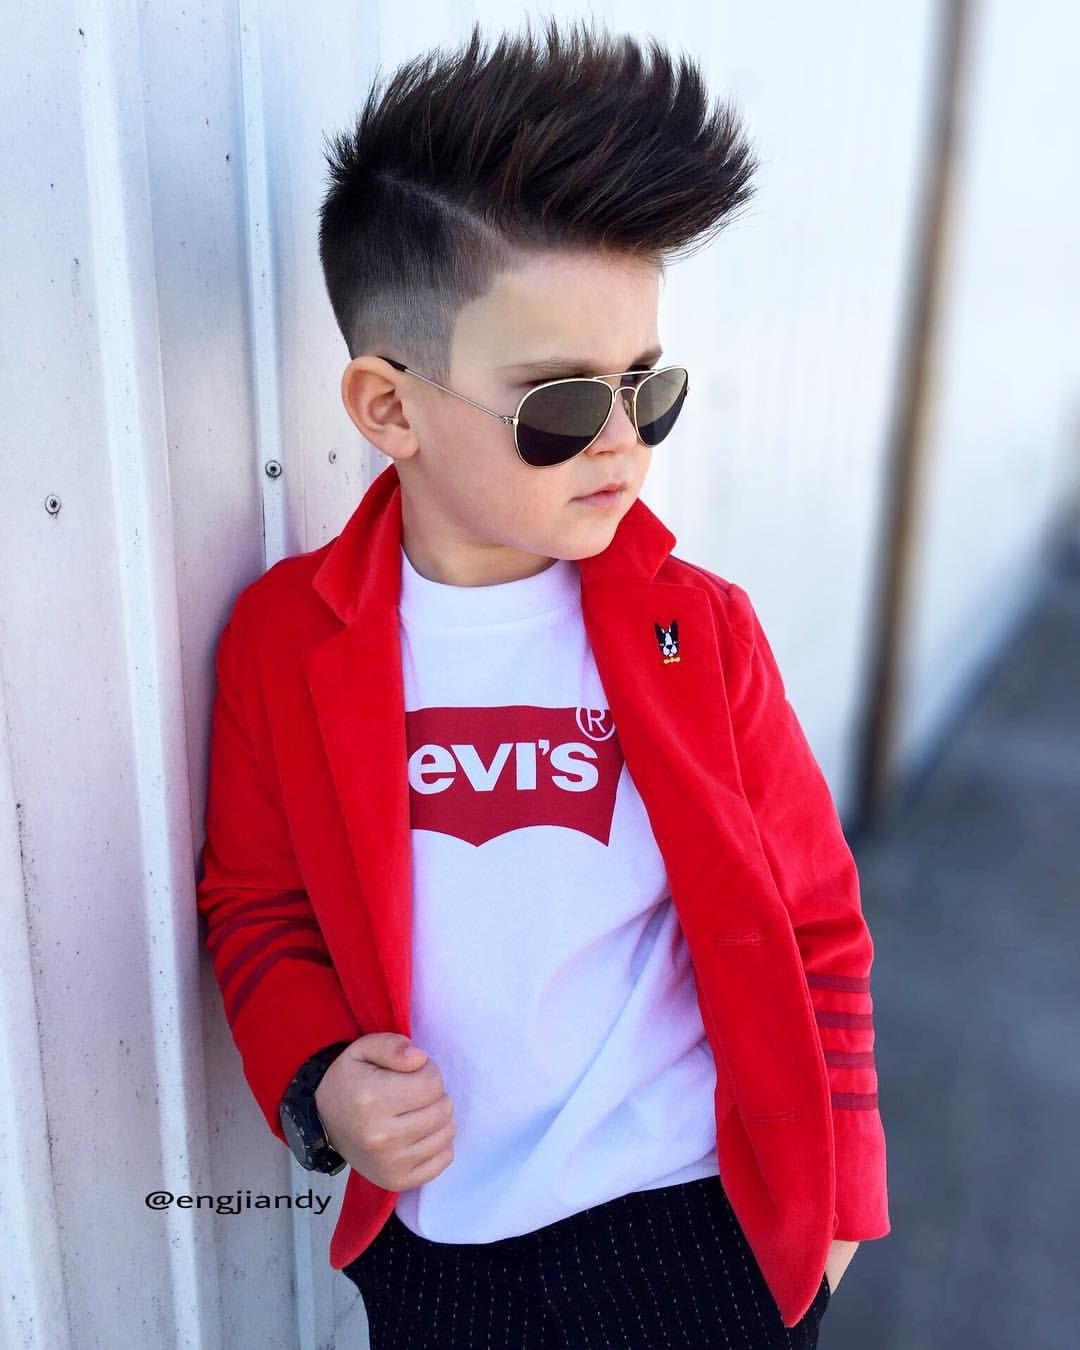 Stylish Child Pic Hd : stylish, child, Engjiandy, (@engjiandy), Instagram, Photos, Videos, Stylish, Fashion,, Outfits,, Trendy, Outfits